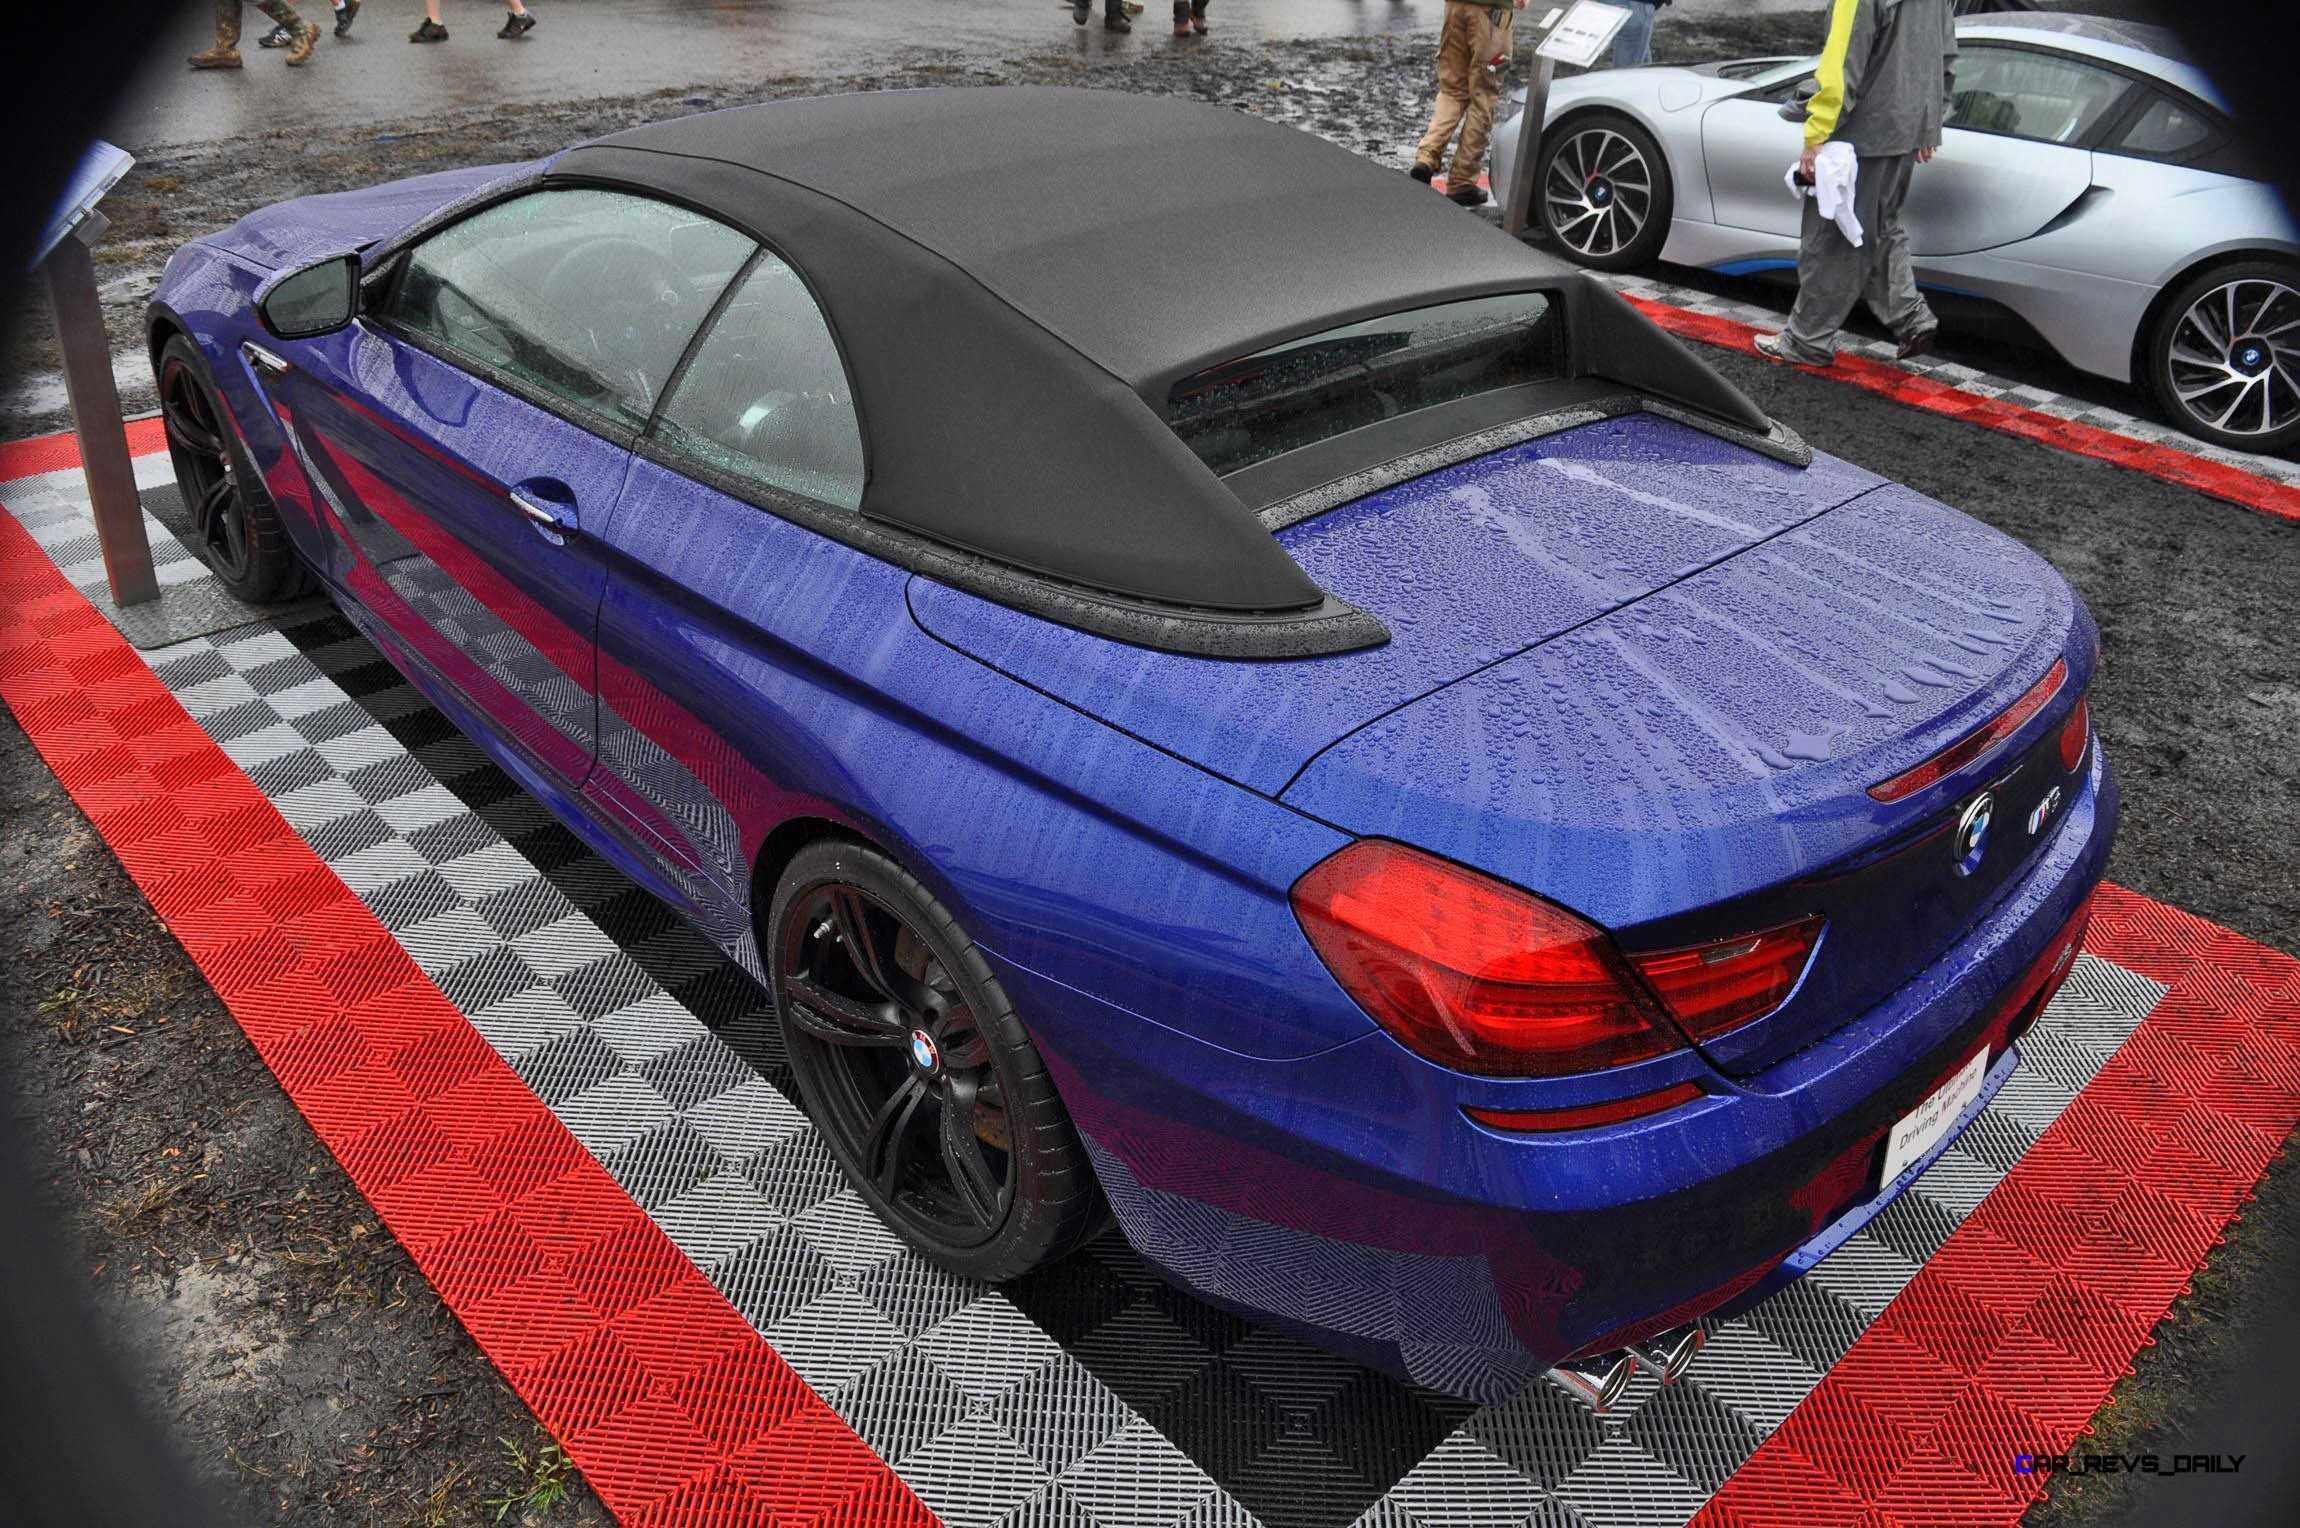 2016 Bmw M6 Convertible San Merino Blue 19